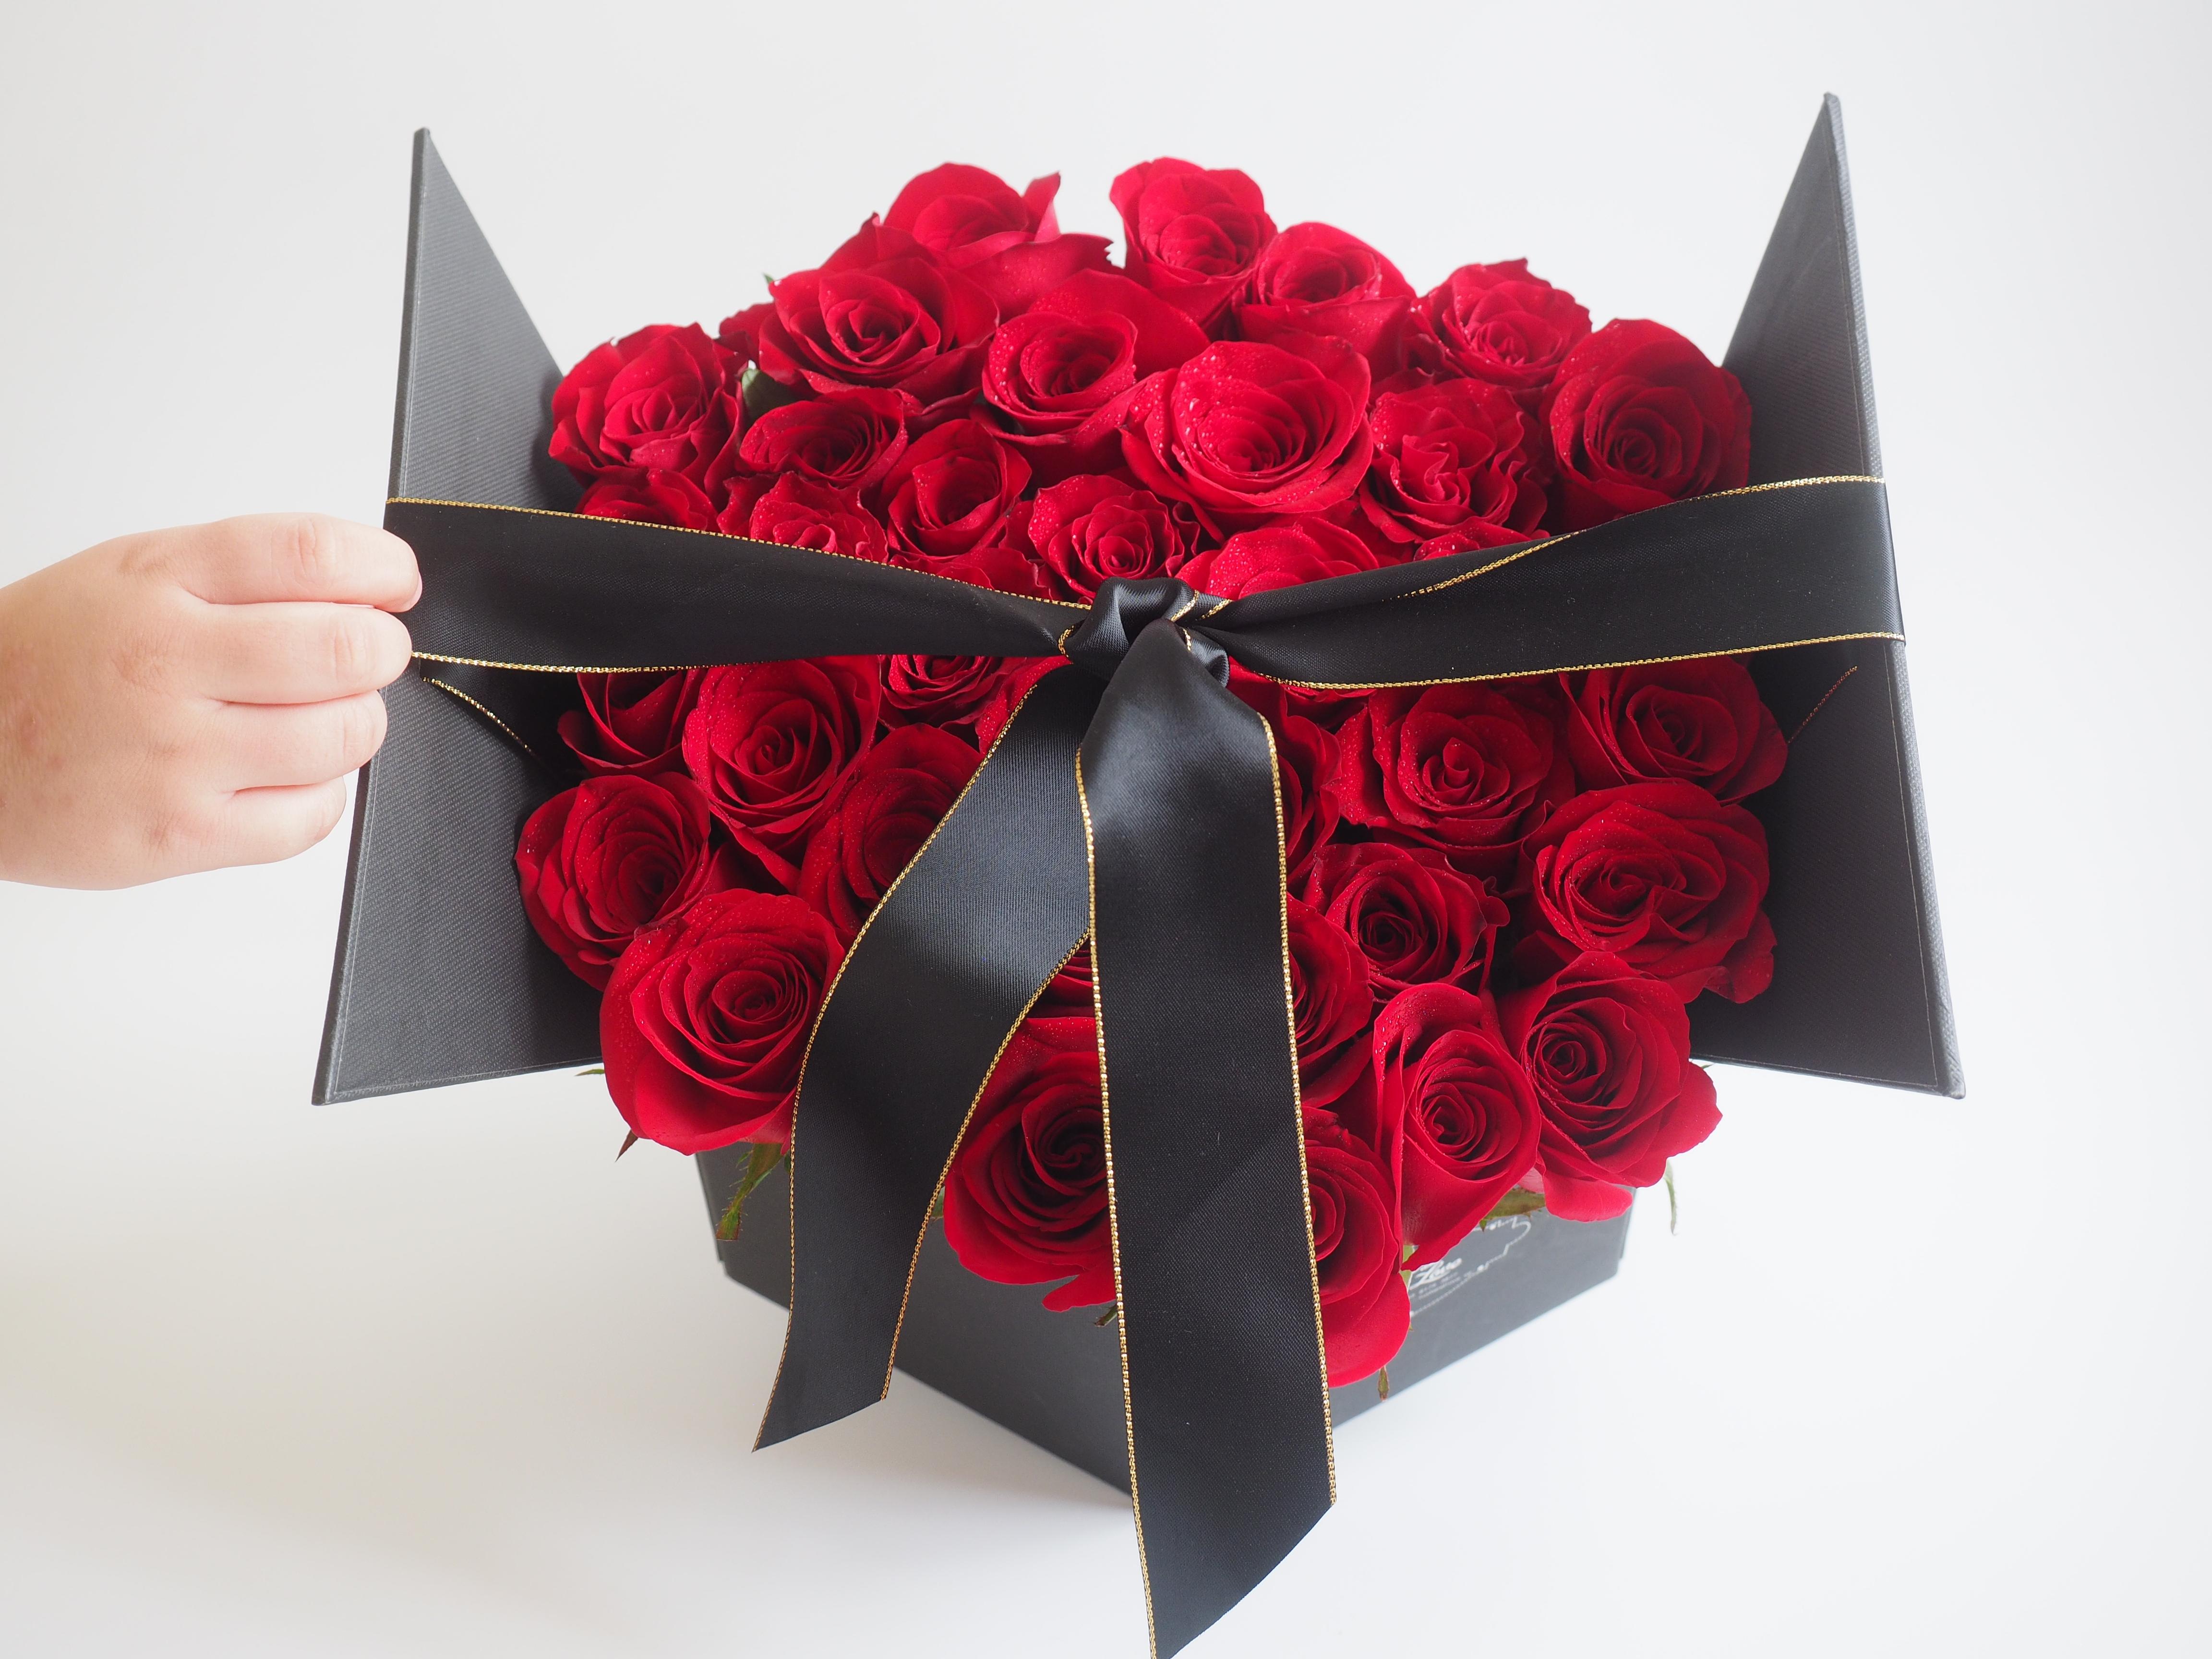 Bloom box 3